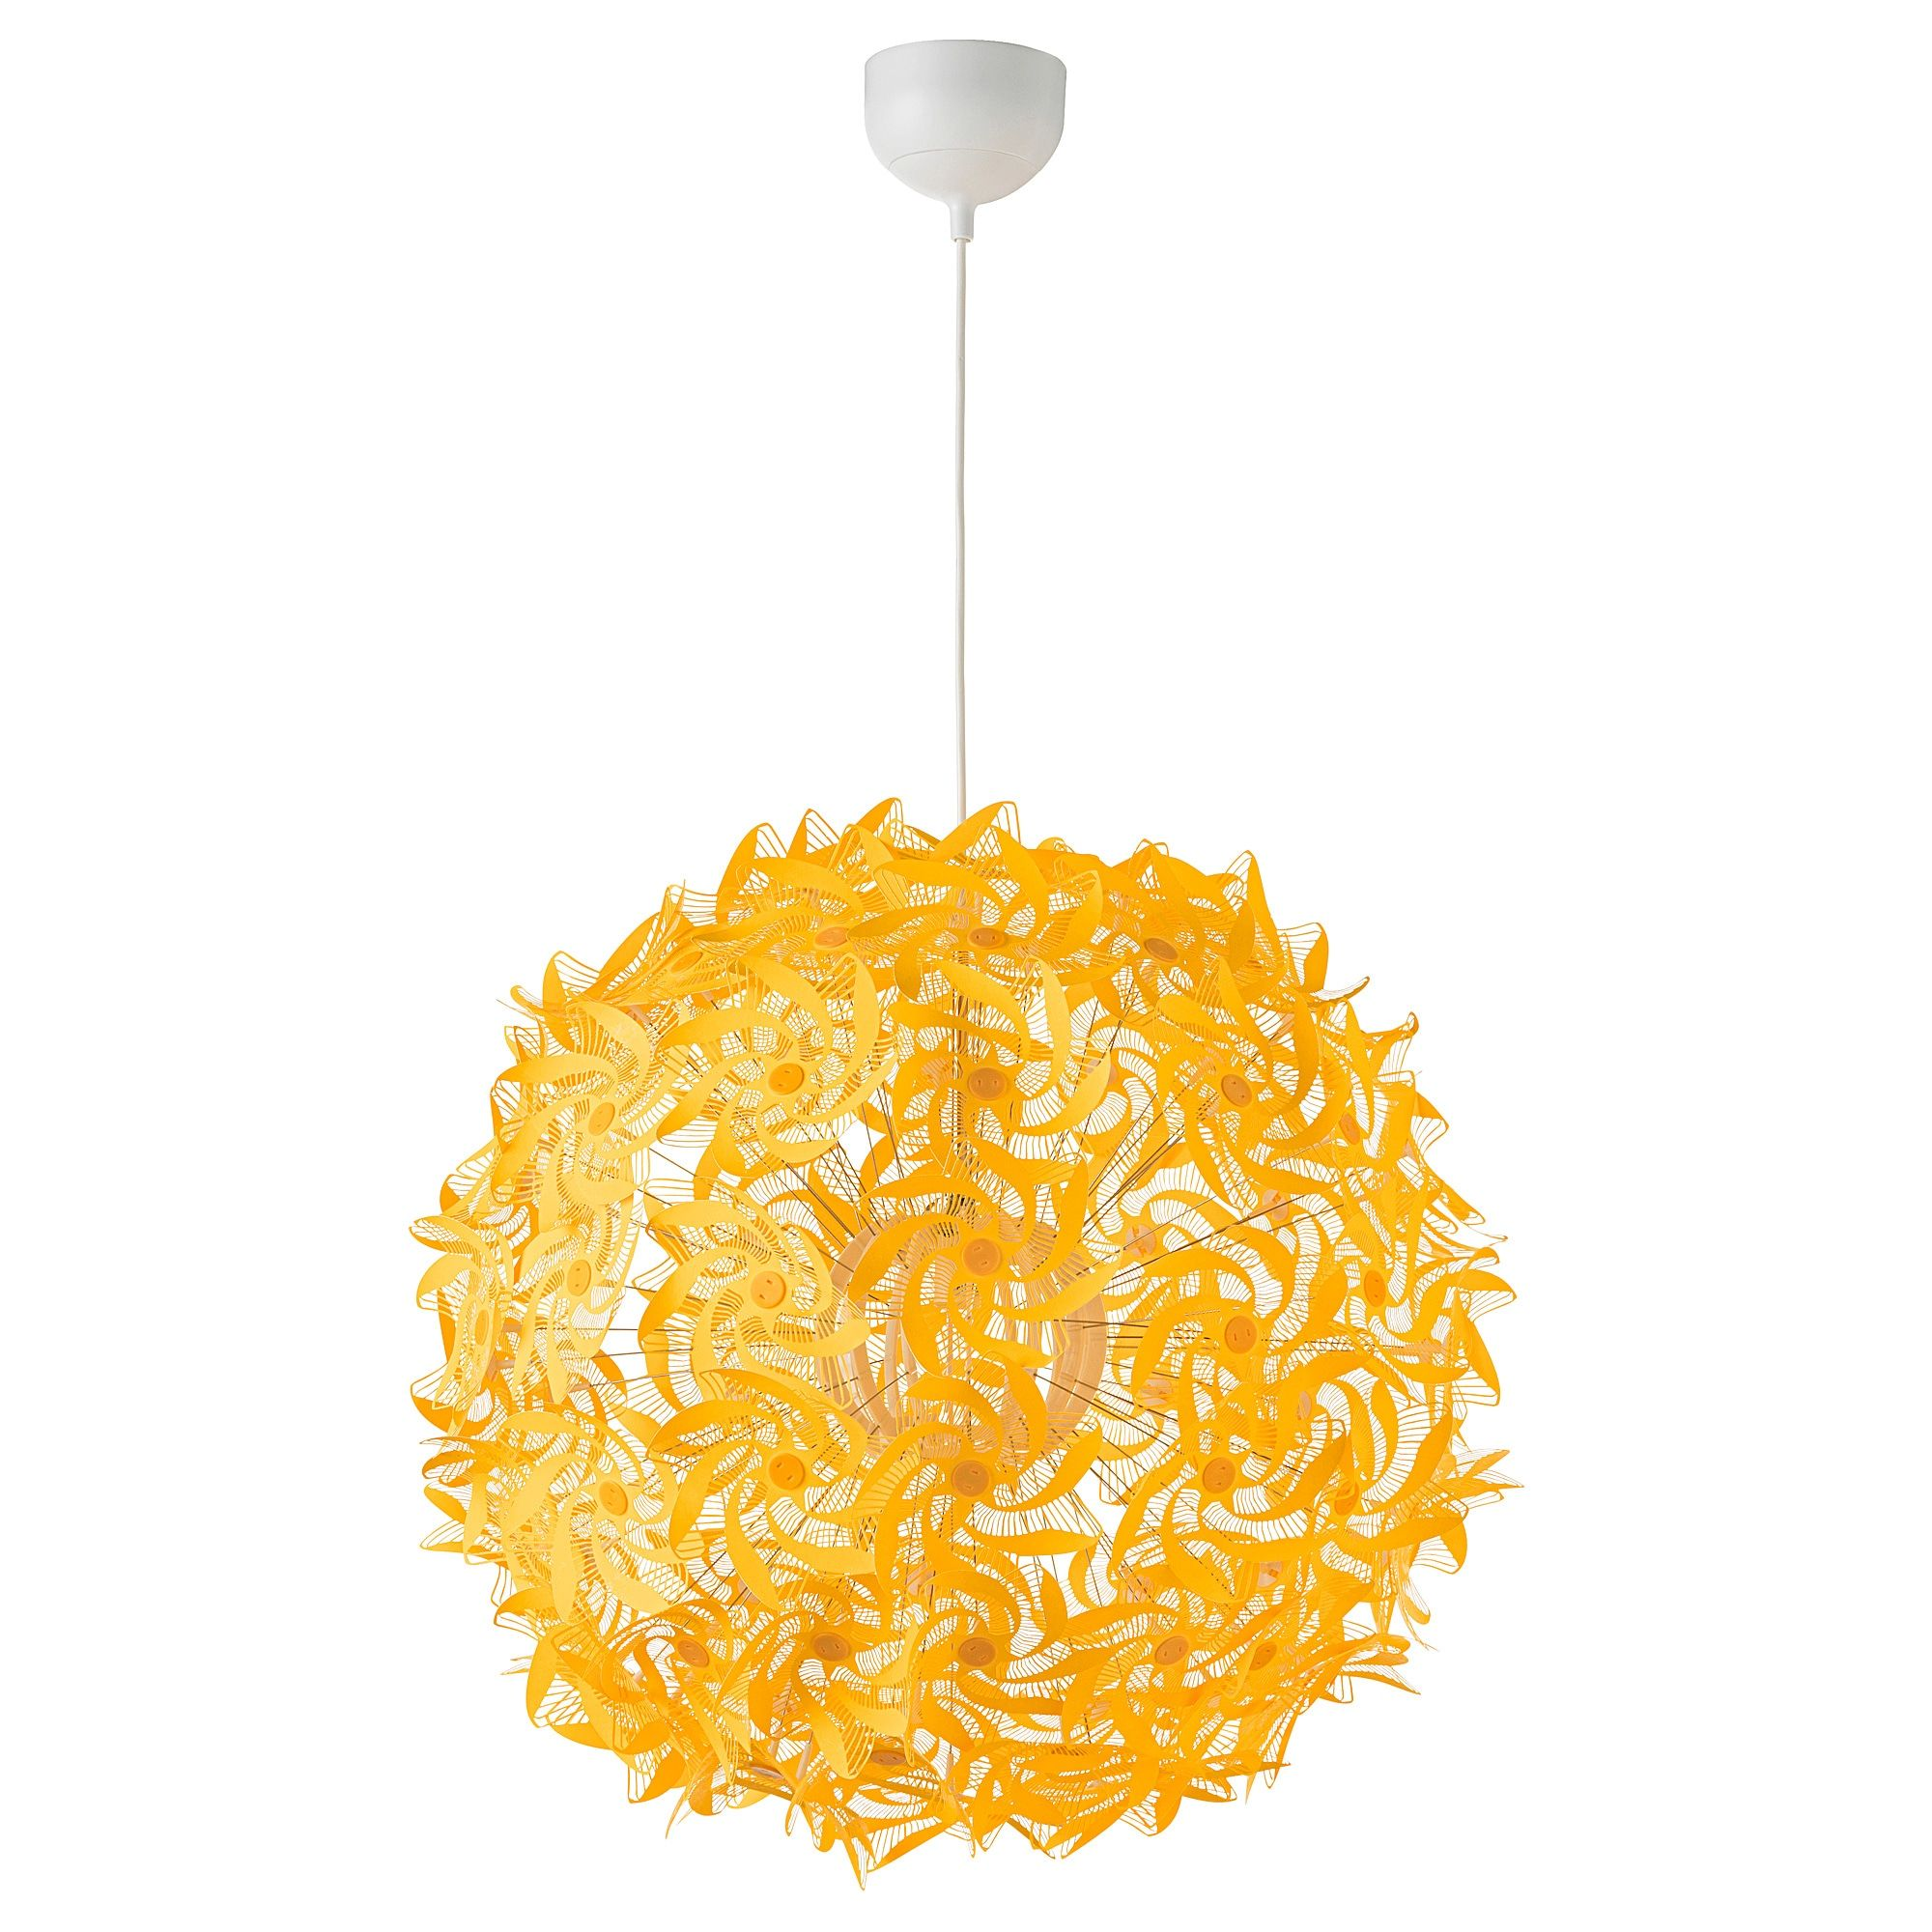 Grimsas Hanglamp Geel 55 Cm Gele Lampen Hanglamp Plafondlamp